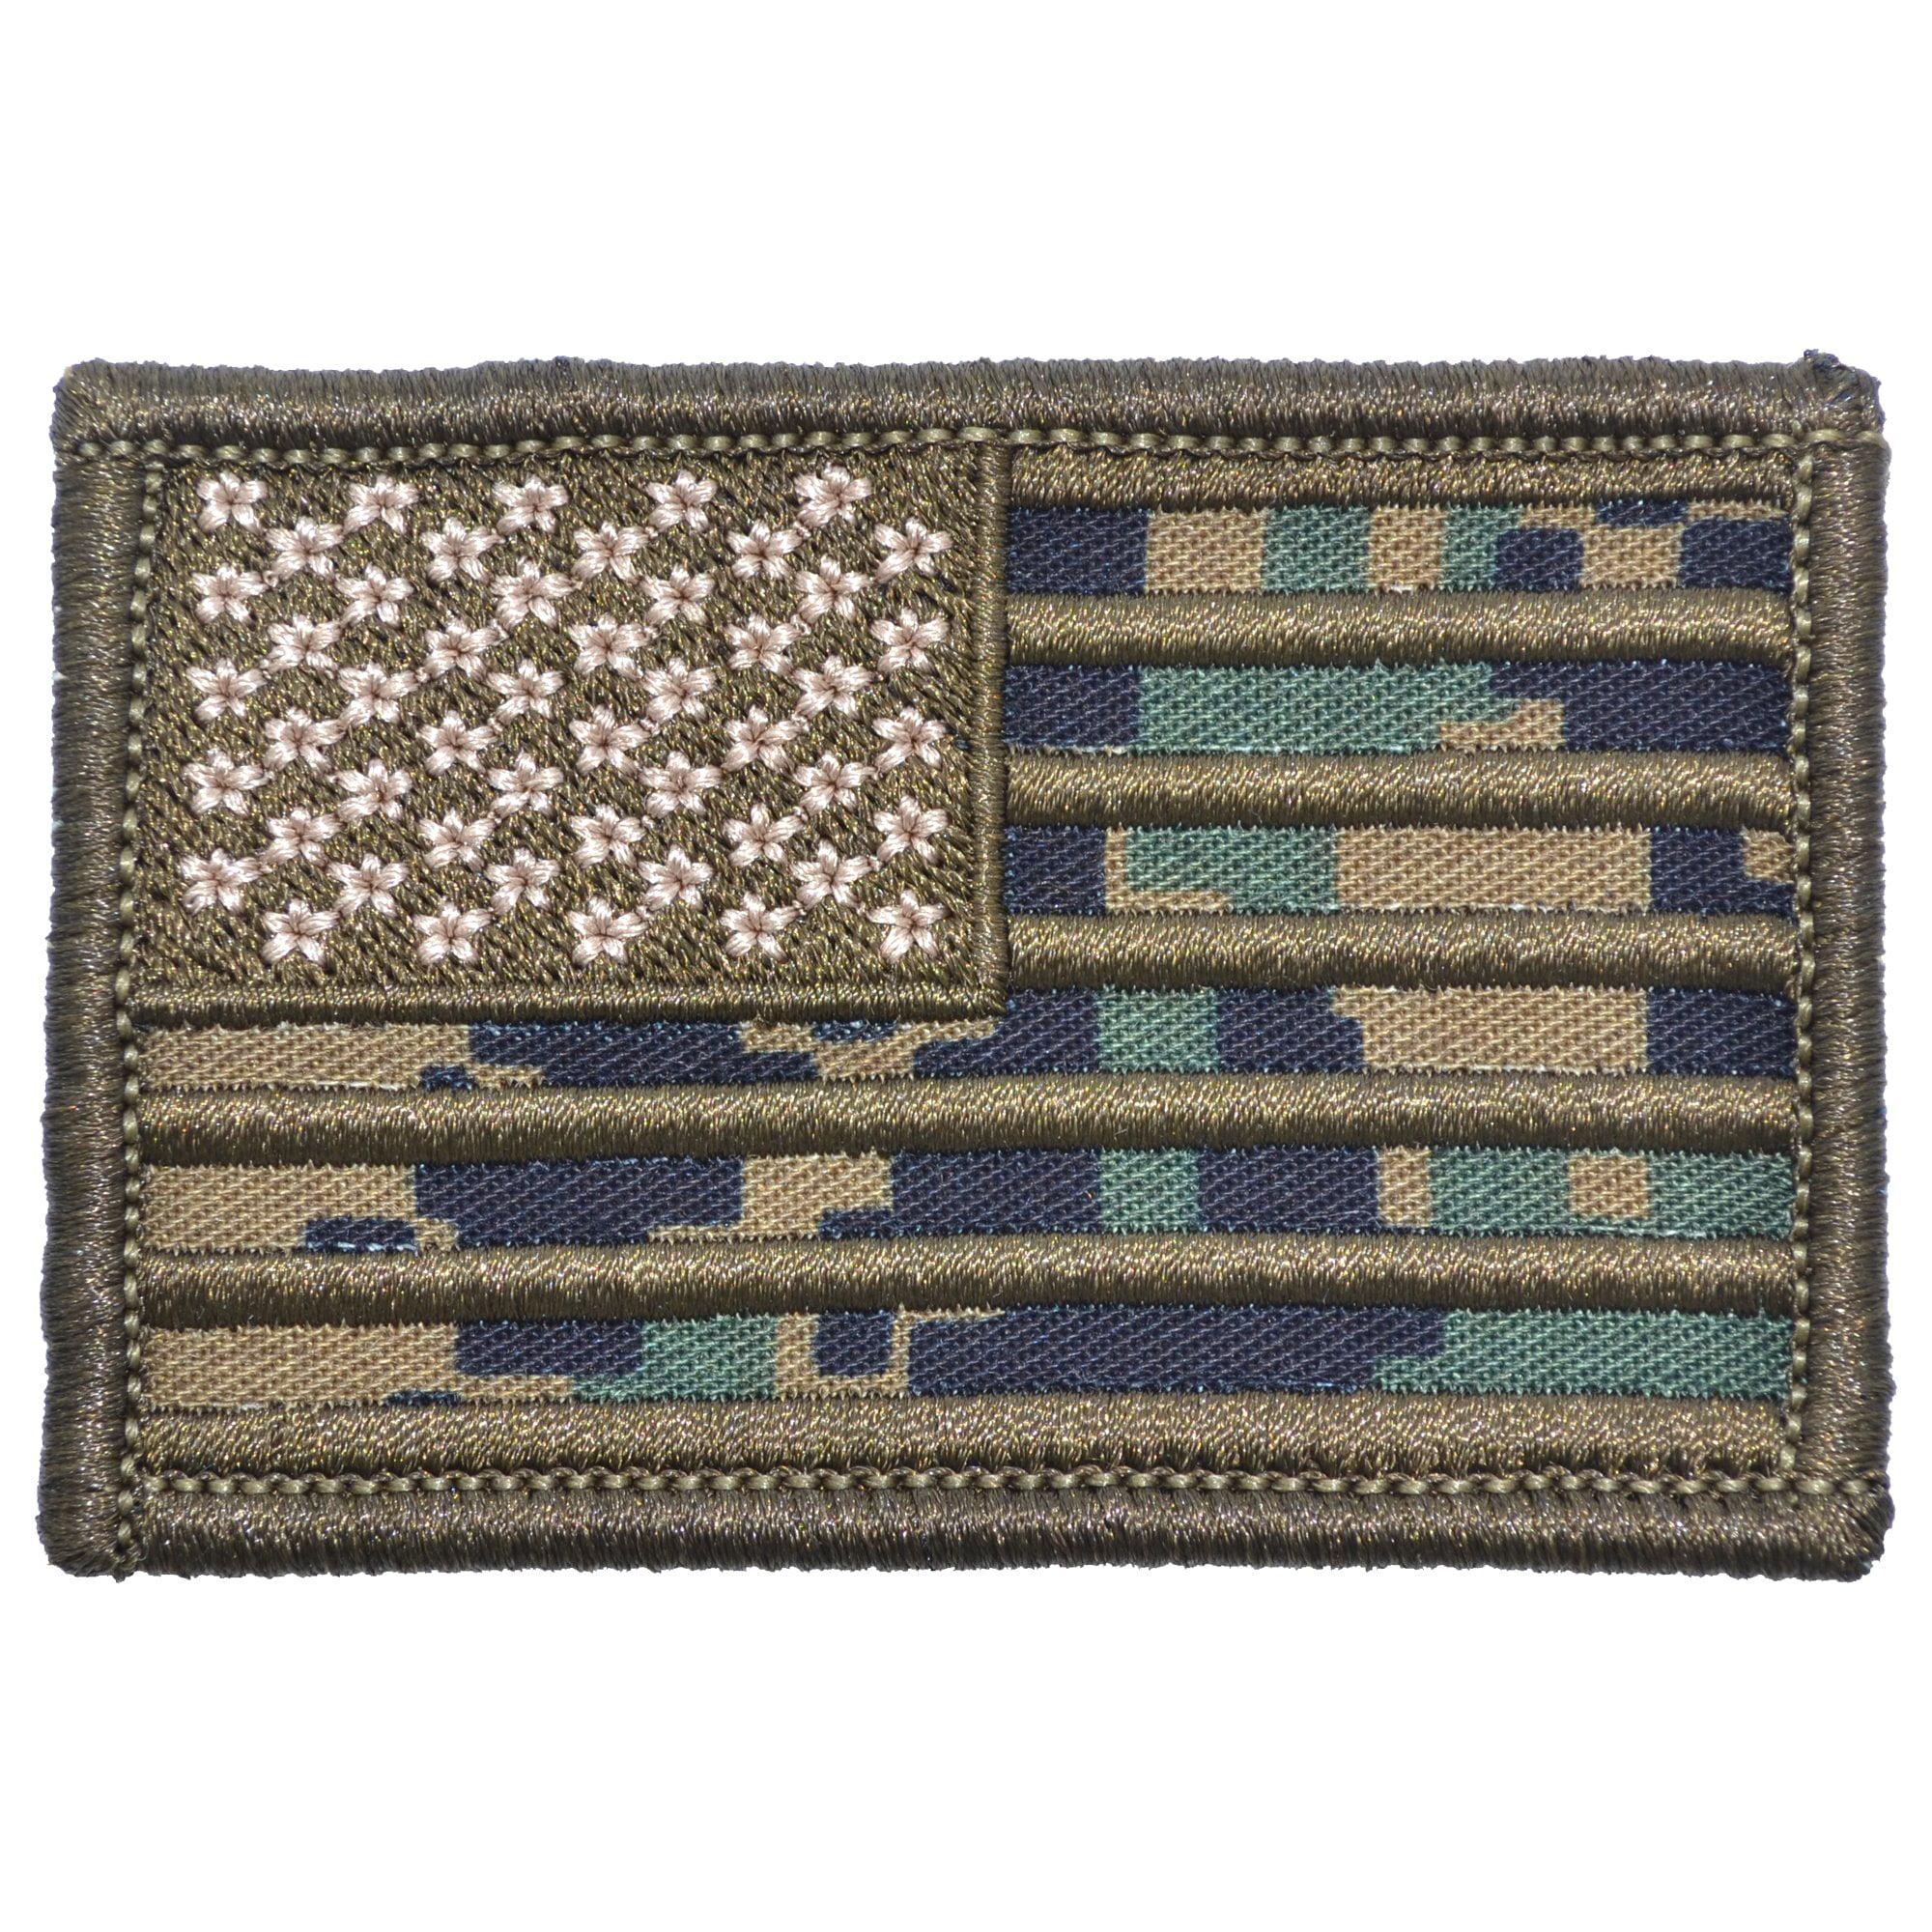 MARPAT Woodland USA Camo Flag - 2x3 Patch